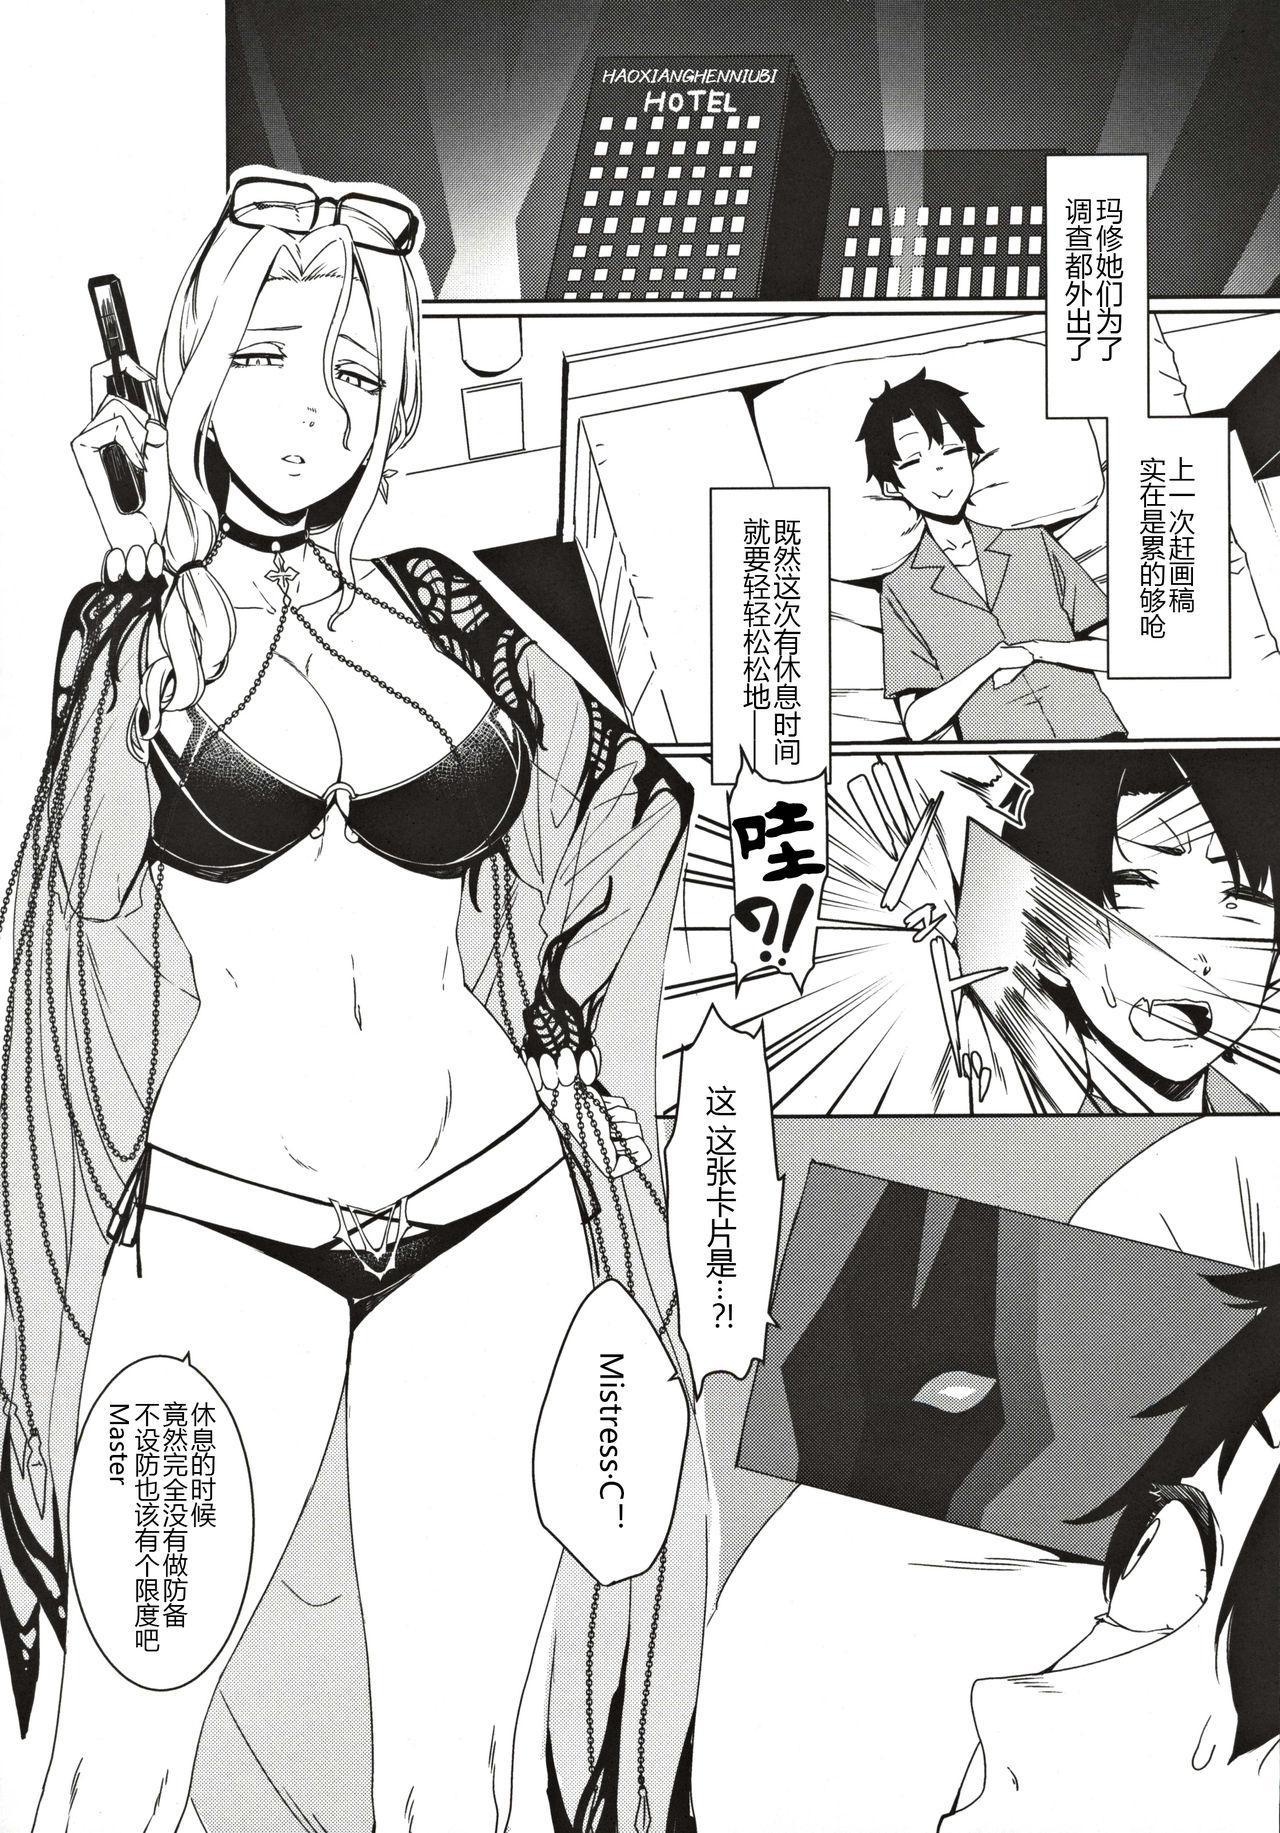 Carmilla-san no Ecchi na no ga Kakitakatta Hon 16